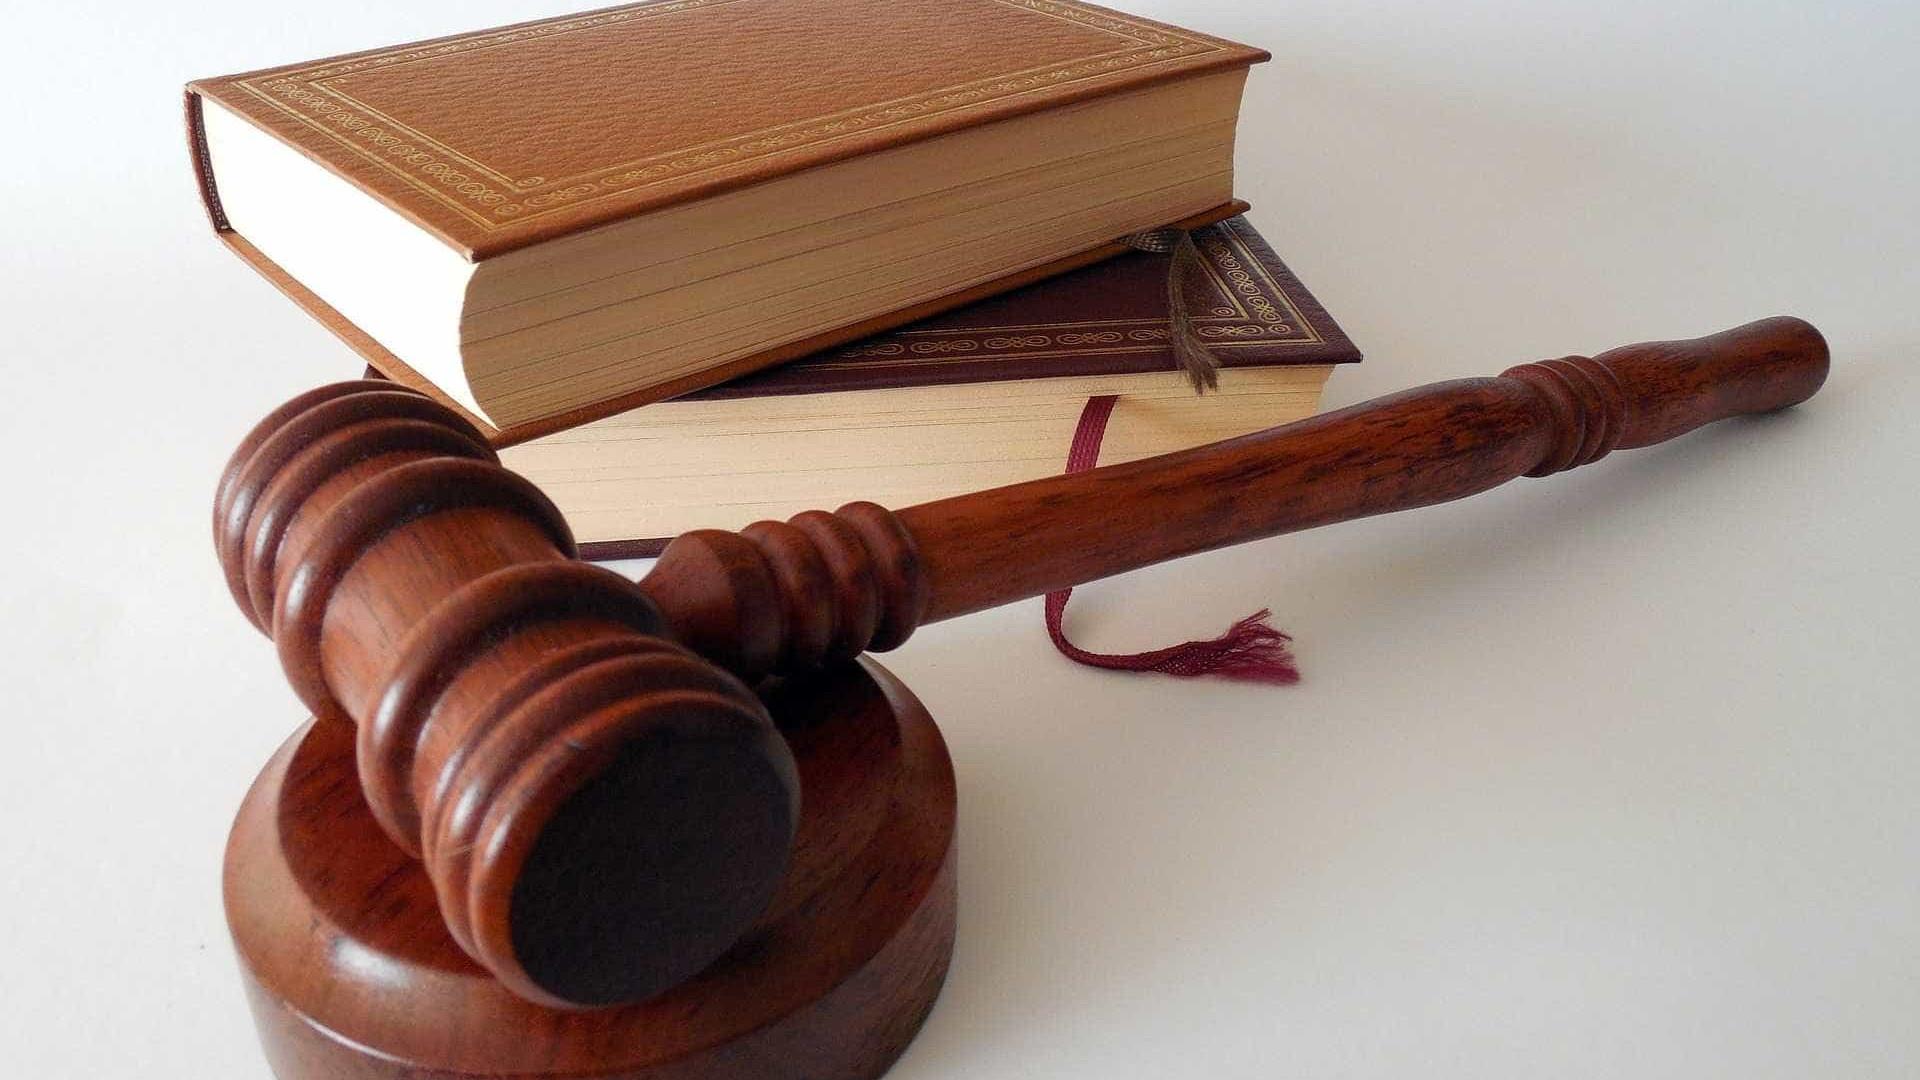 Jovem acusado de matar namorada durante sexo é condenado a 13 anos